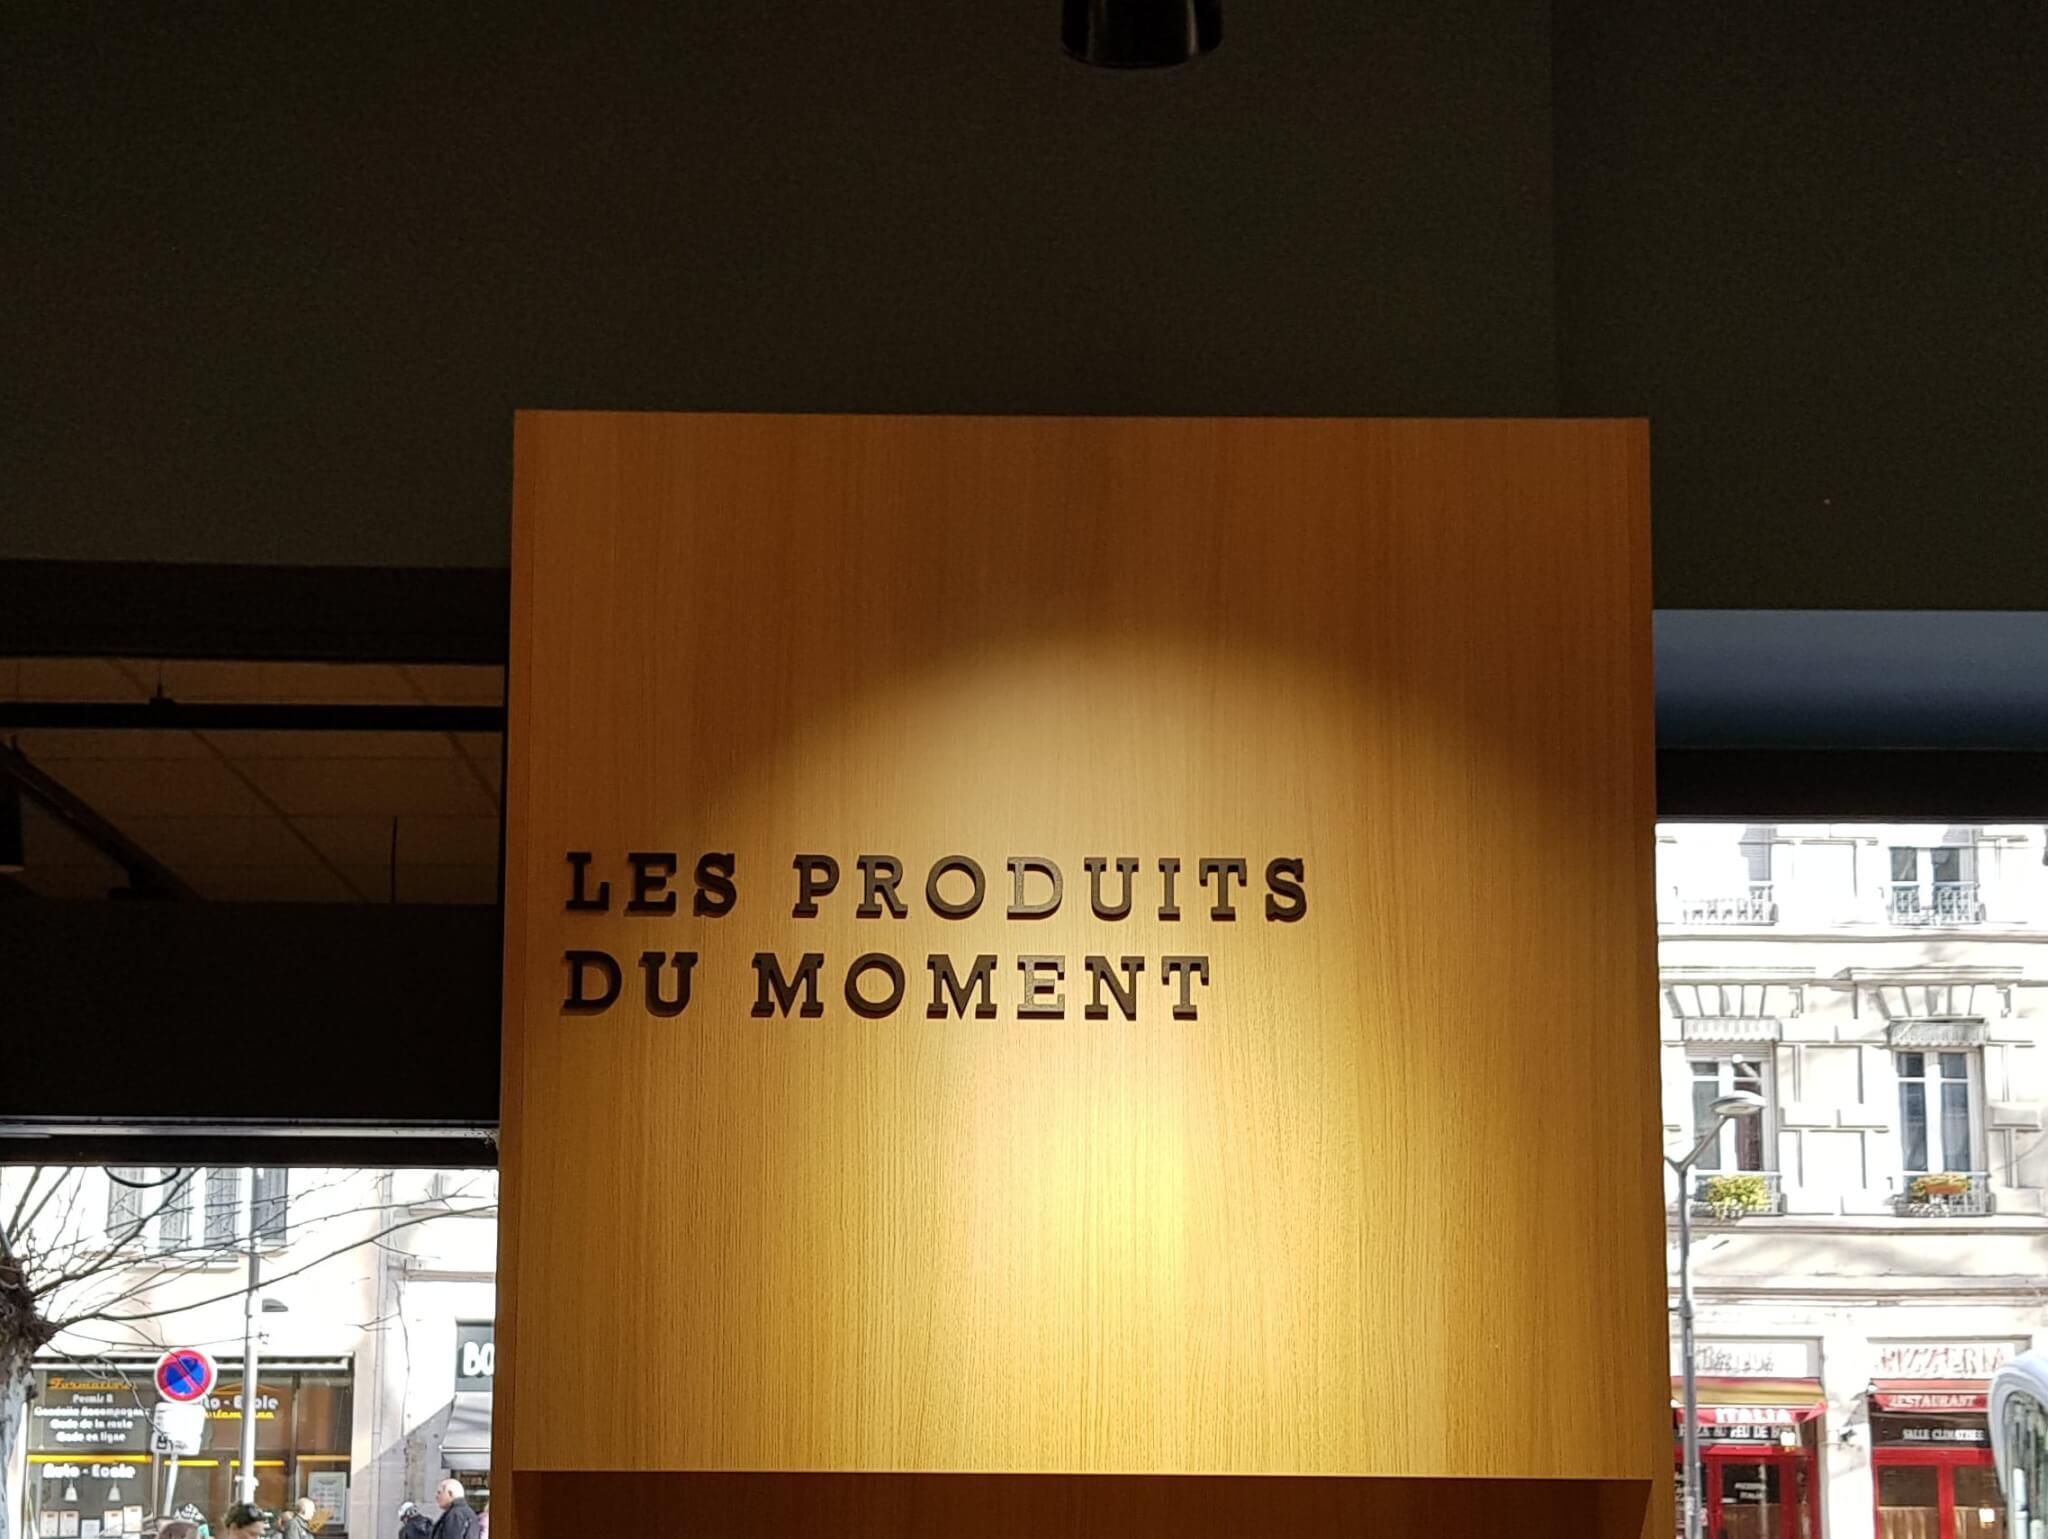 Vos enseignes à Lyon - Habillage façade et enseigne Pharmacie Lyon - Sainte Blandine - Perrache